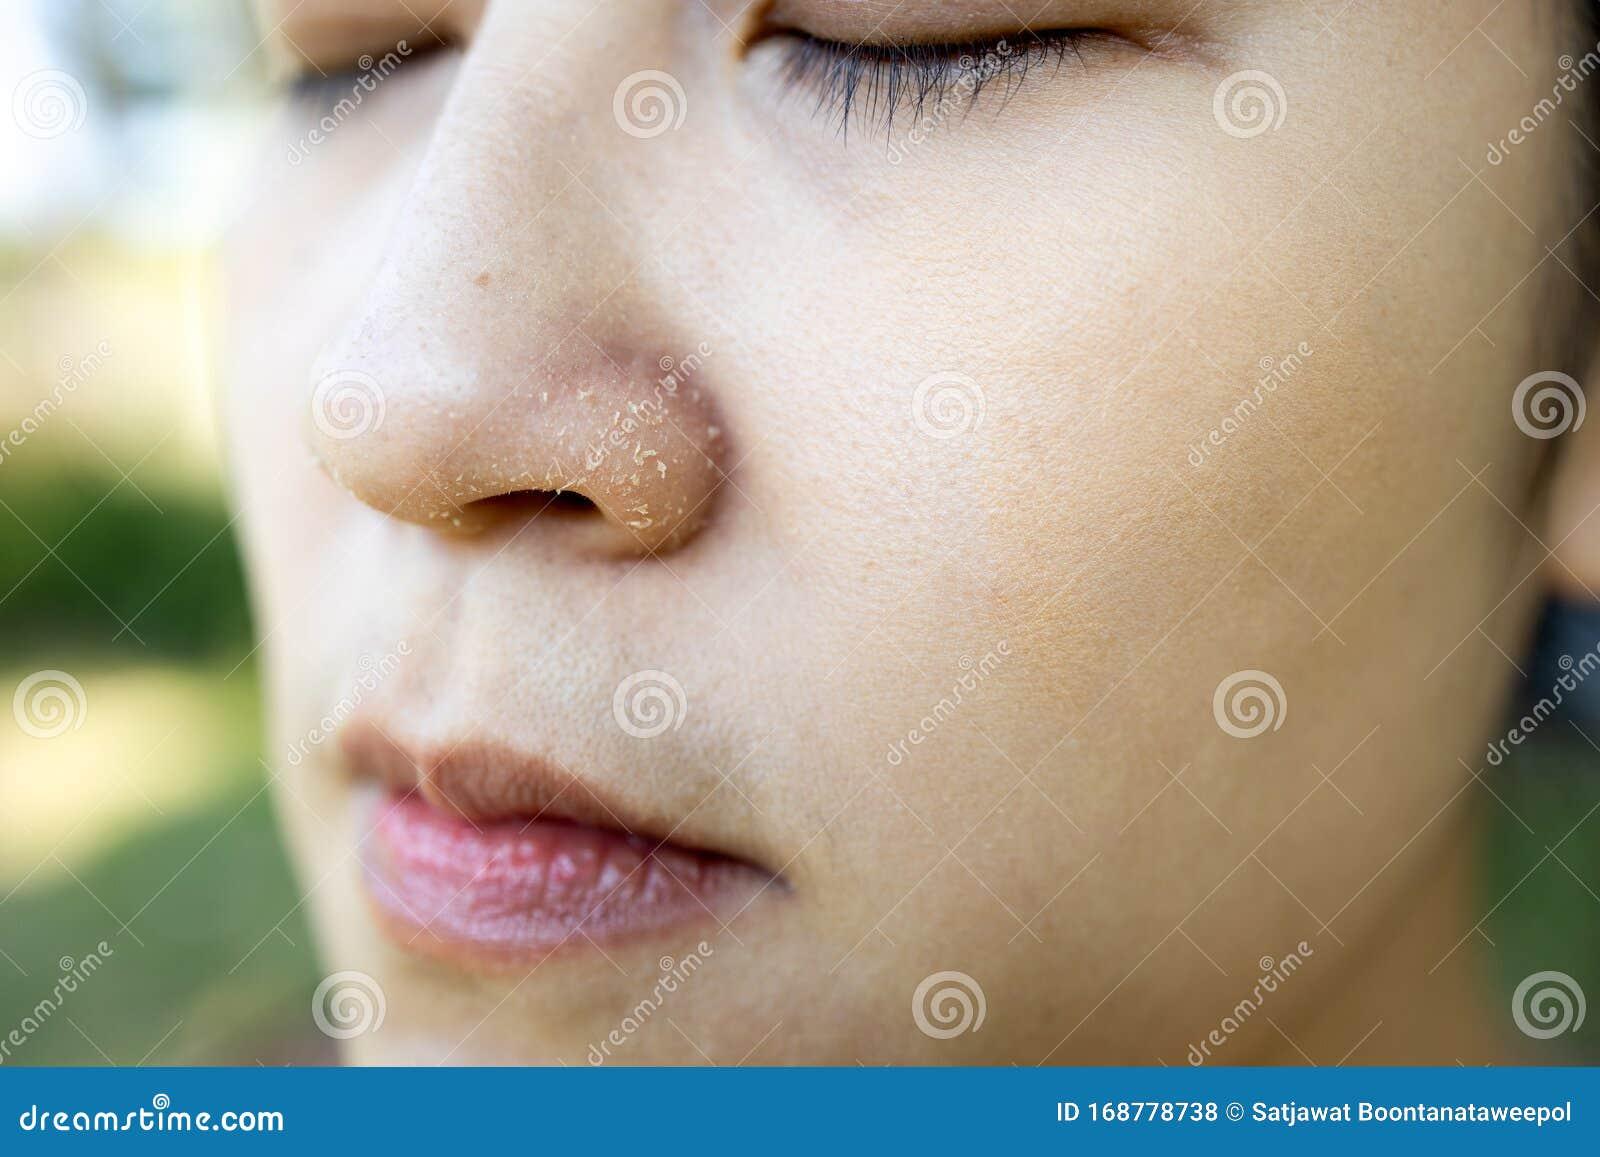 Nase trockene haut Trockene Nasenschleimhaut